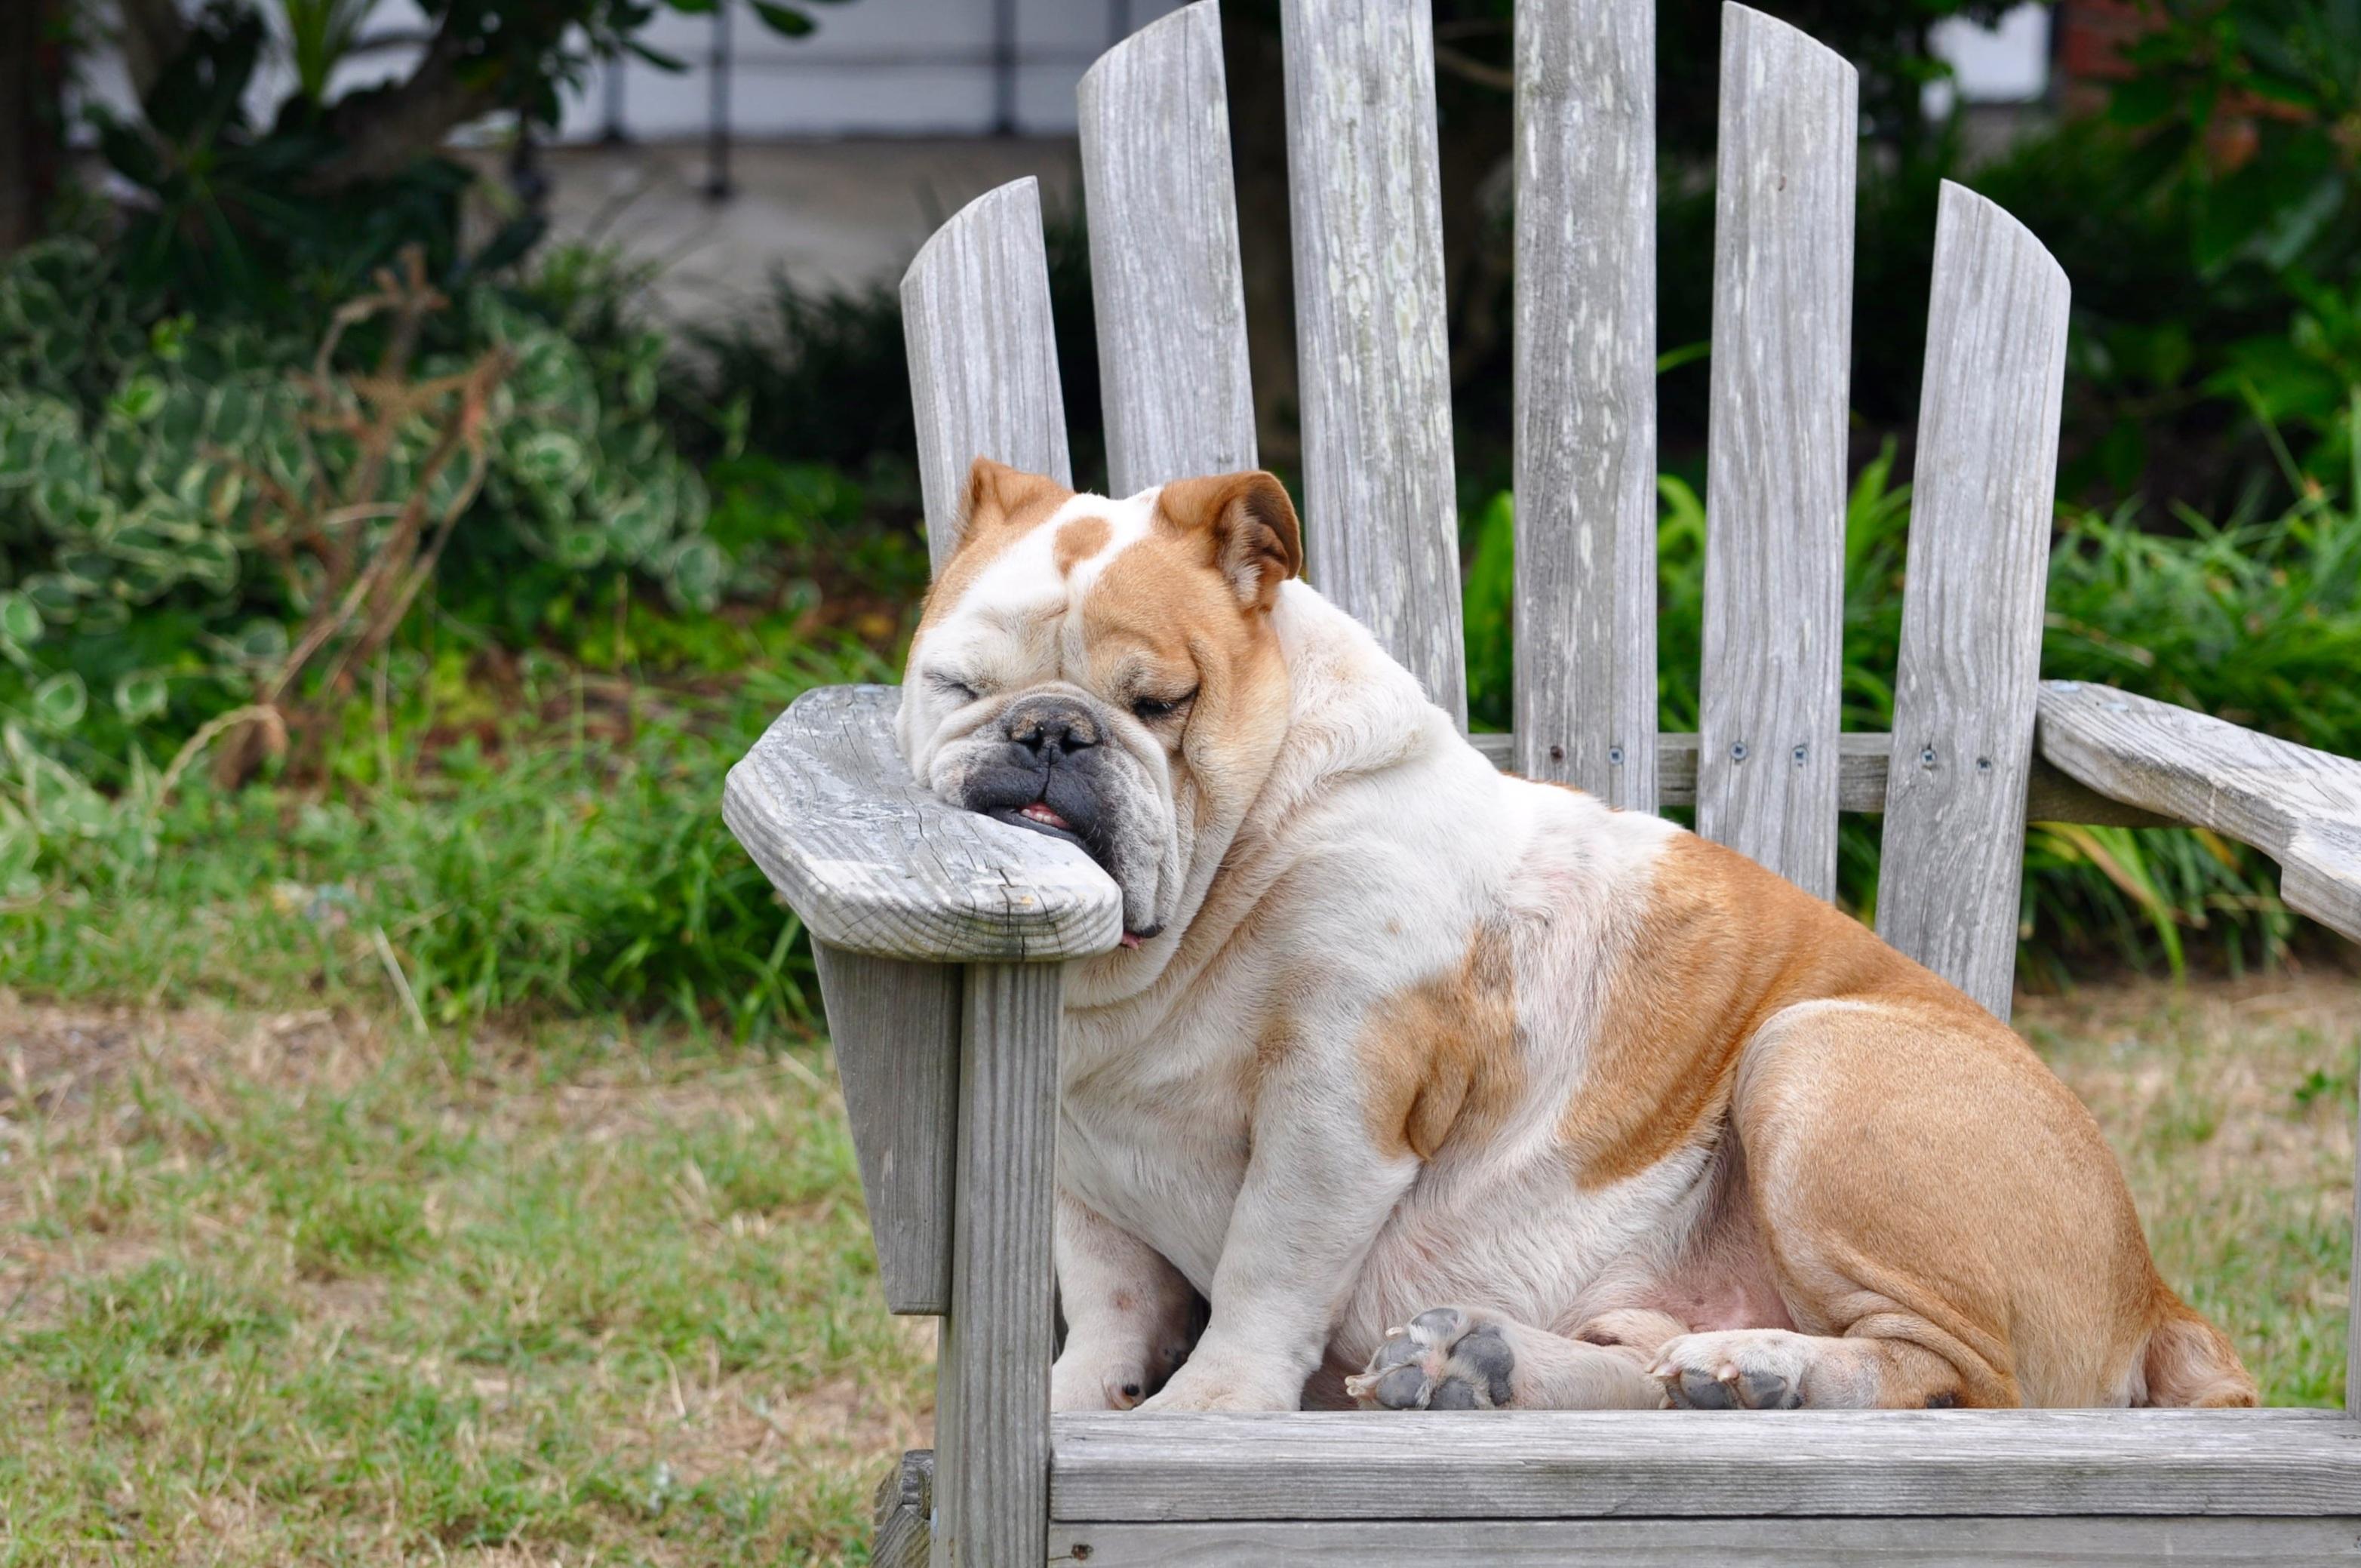 Wonderful Bulldog Canine Adorable Dog - puppy-dog-animal-canine-pet-sleeping-mammal-rest-bulldog-nap-sleepy-vertebrate-funny-tired-resting-adorable-dog-breed-comfortable-old-english-bulldog-dog-like-mammal-dog-breed-group-olde-english-bulldogge-871747  Image_229743  .jpg